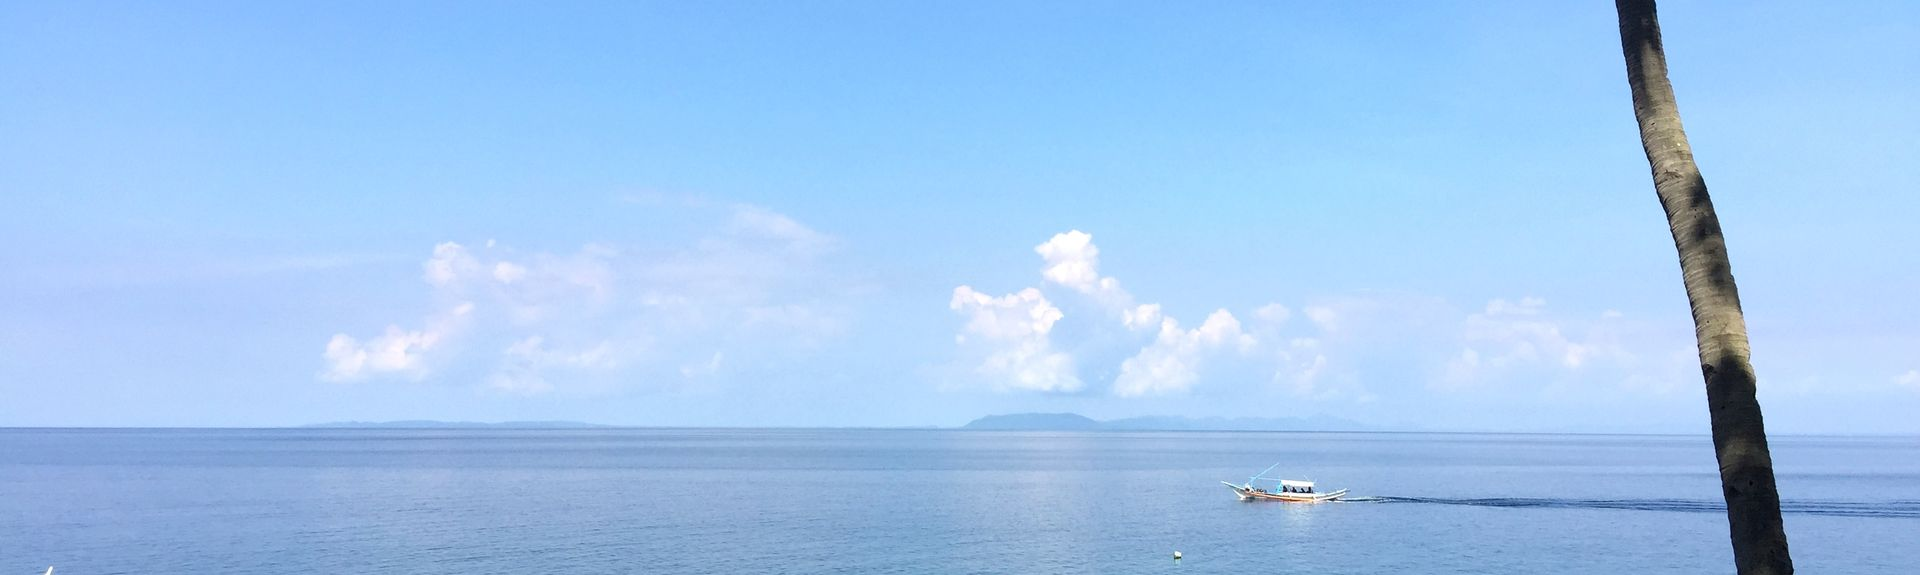 San Luis, Calabarzon, Philippines